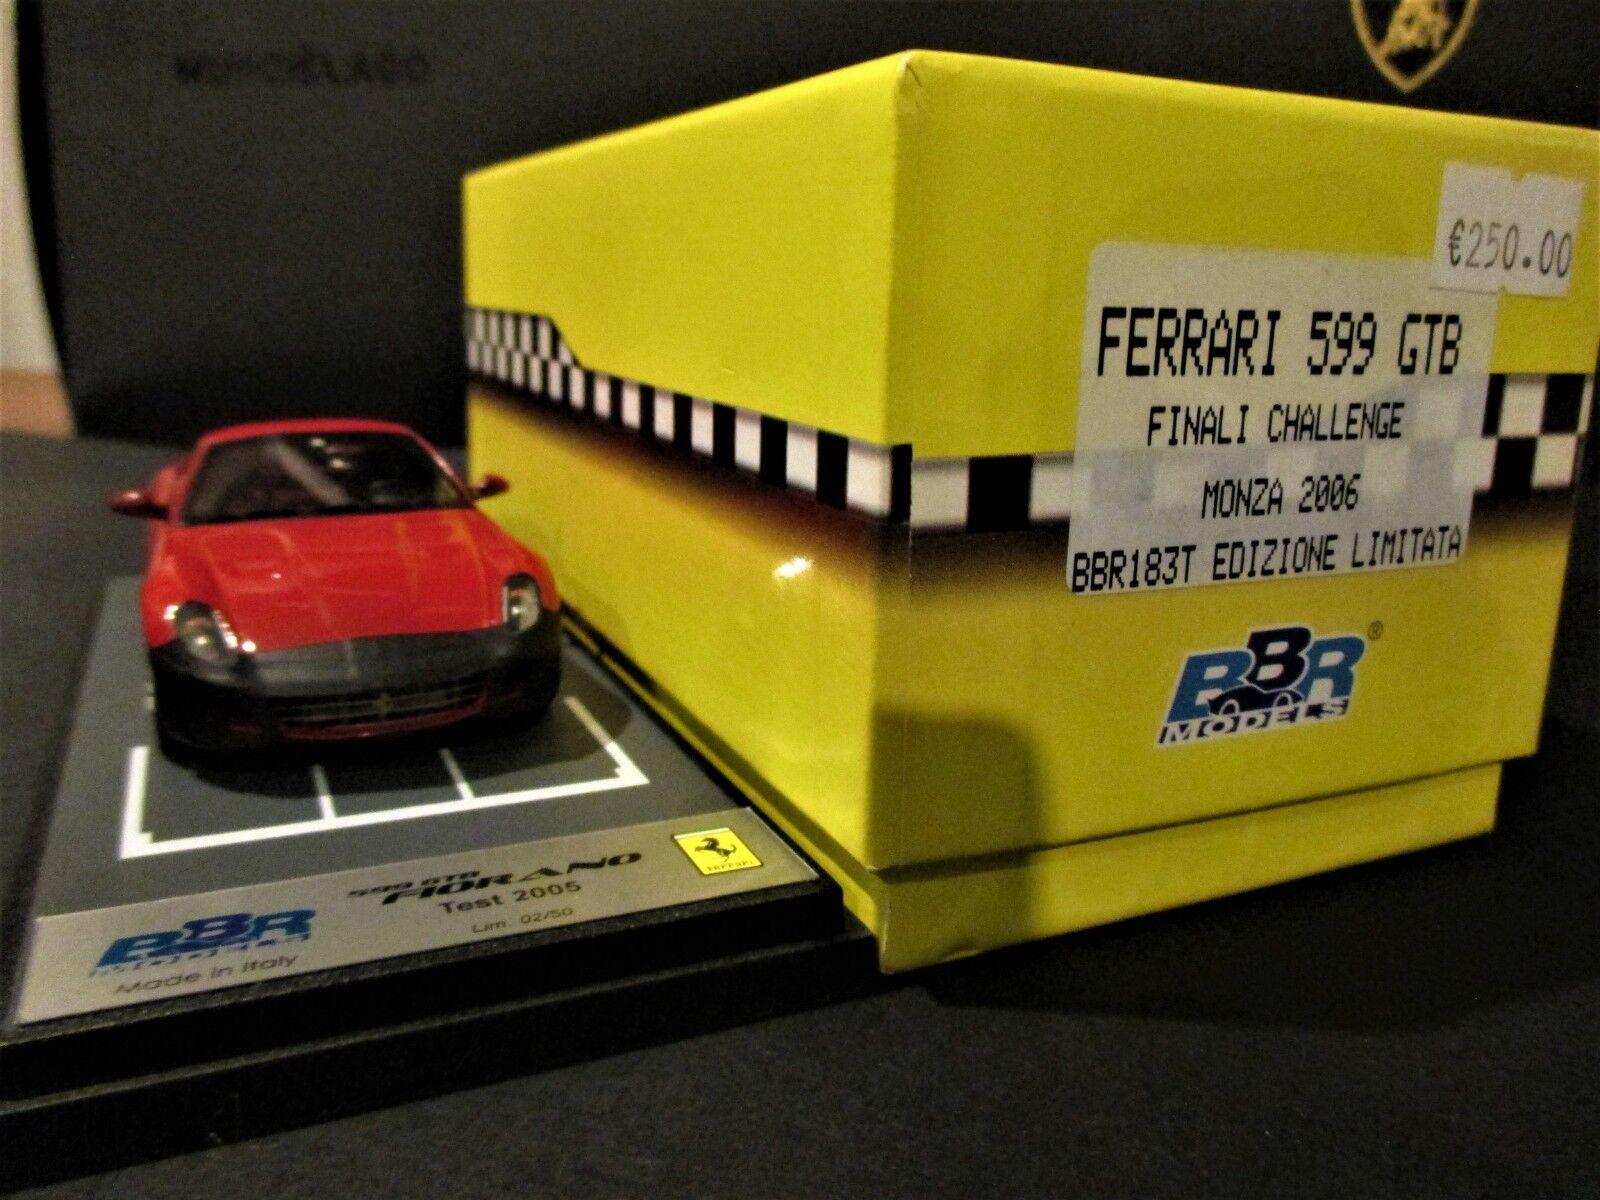 tienda de venta RARE FERRARI FERRARI FERRARI 599 GTB FINALI CHALLENGE  TEST MONZA 2006 BBR 1 43 n°02 50 BBR183T  marcas de moda